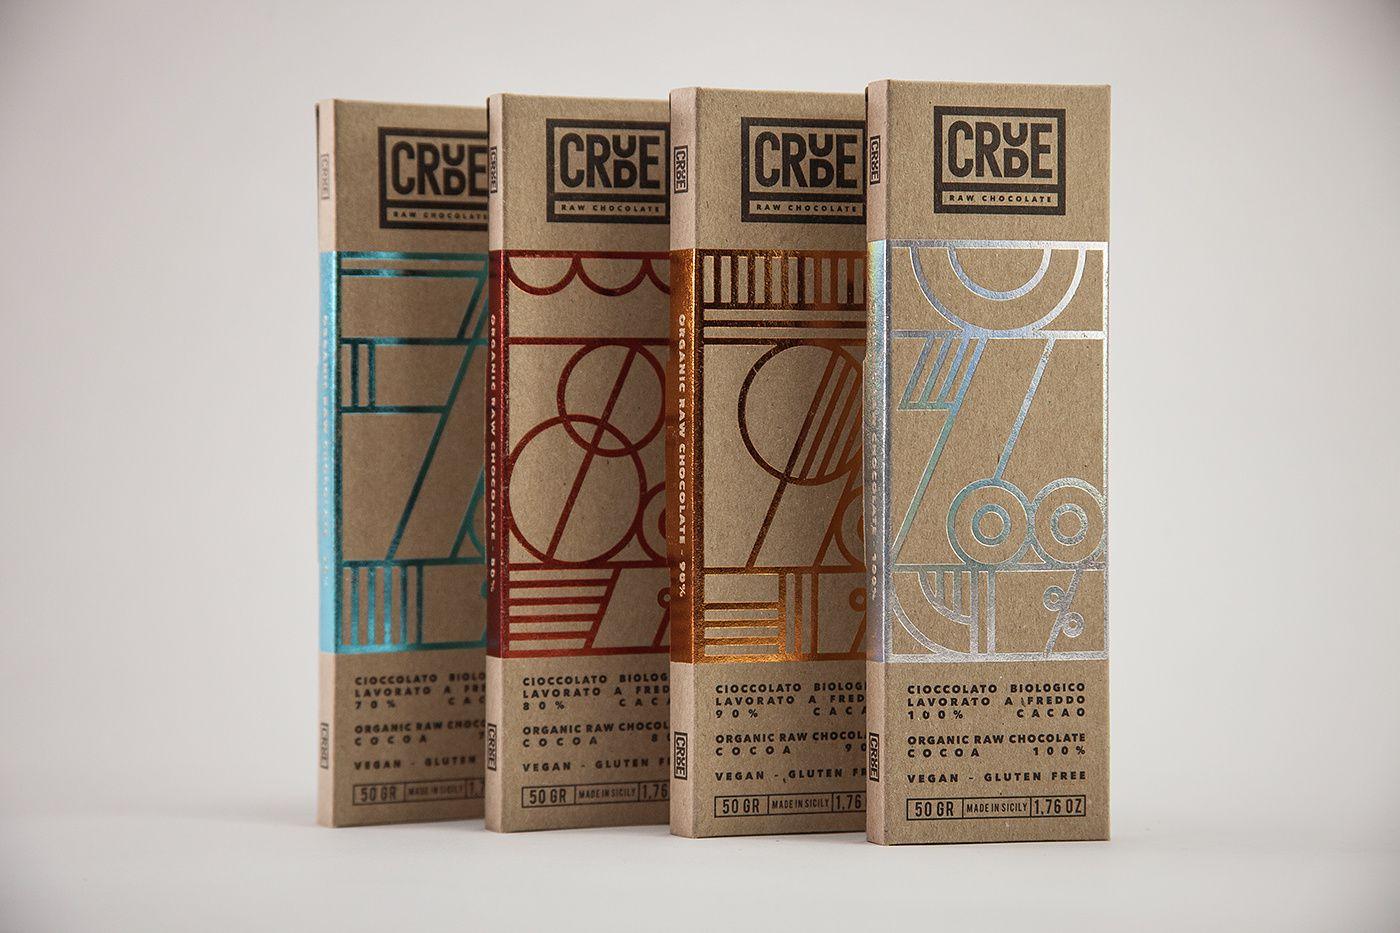 Crude (chocolat cru bio) I Design : Happycentro, Italie (décembre 2016)